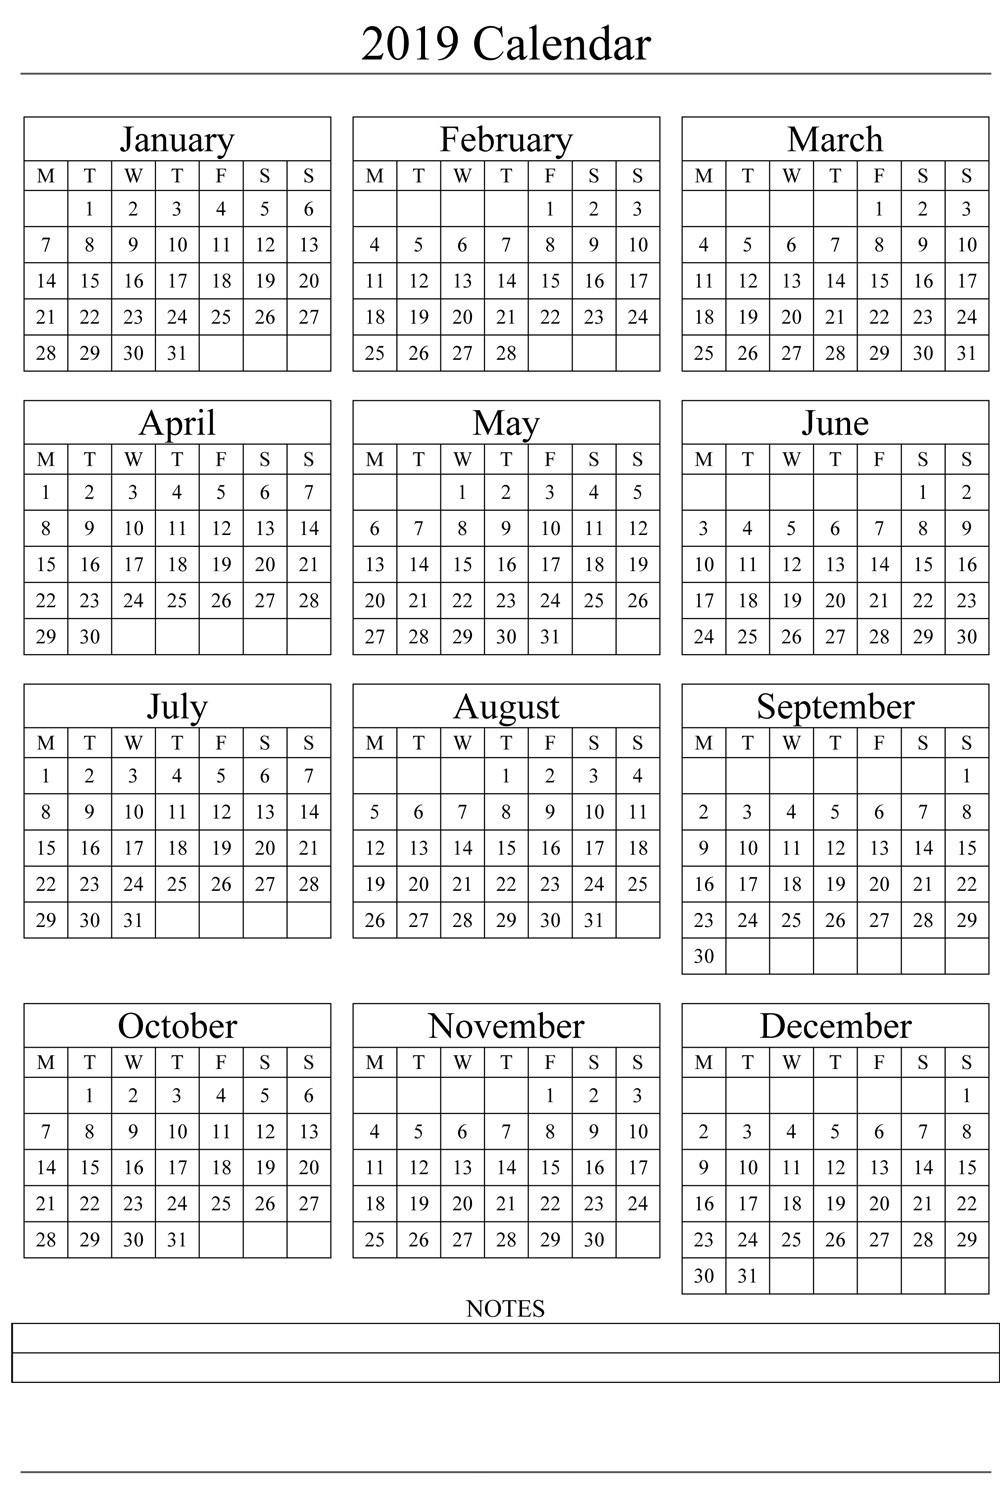 Calendar 2019 Pdf | Calendars